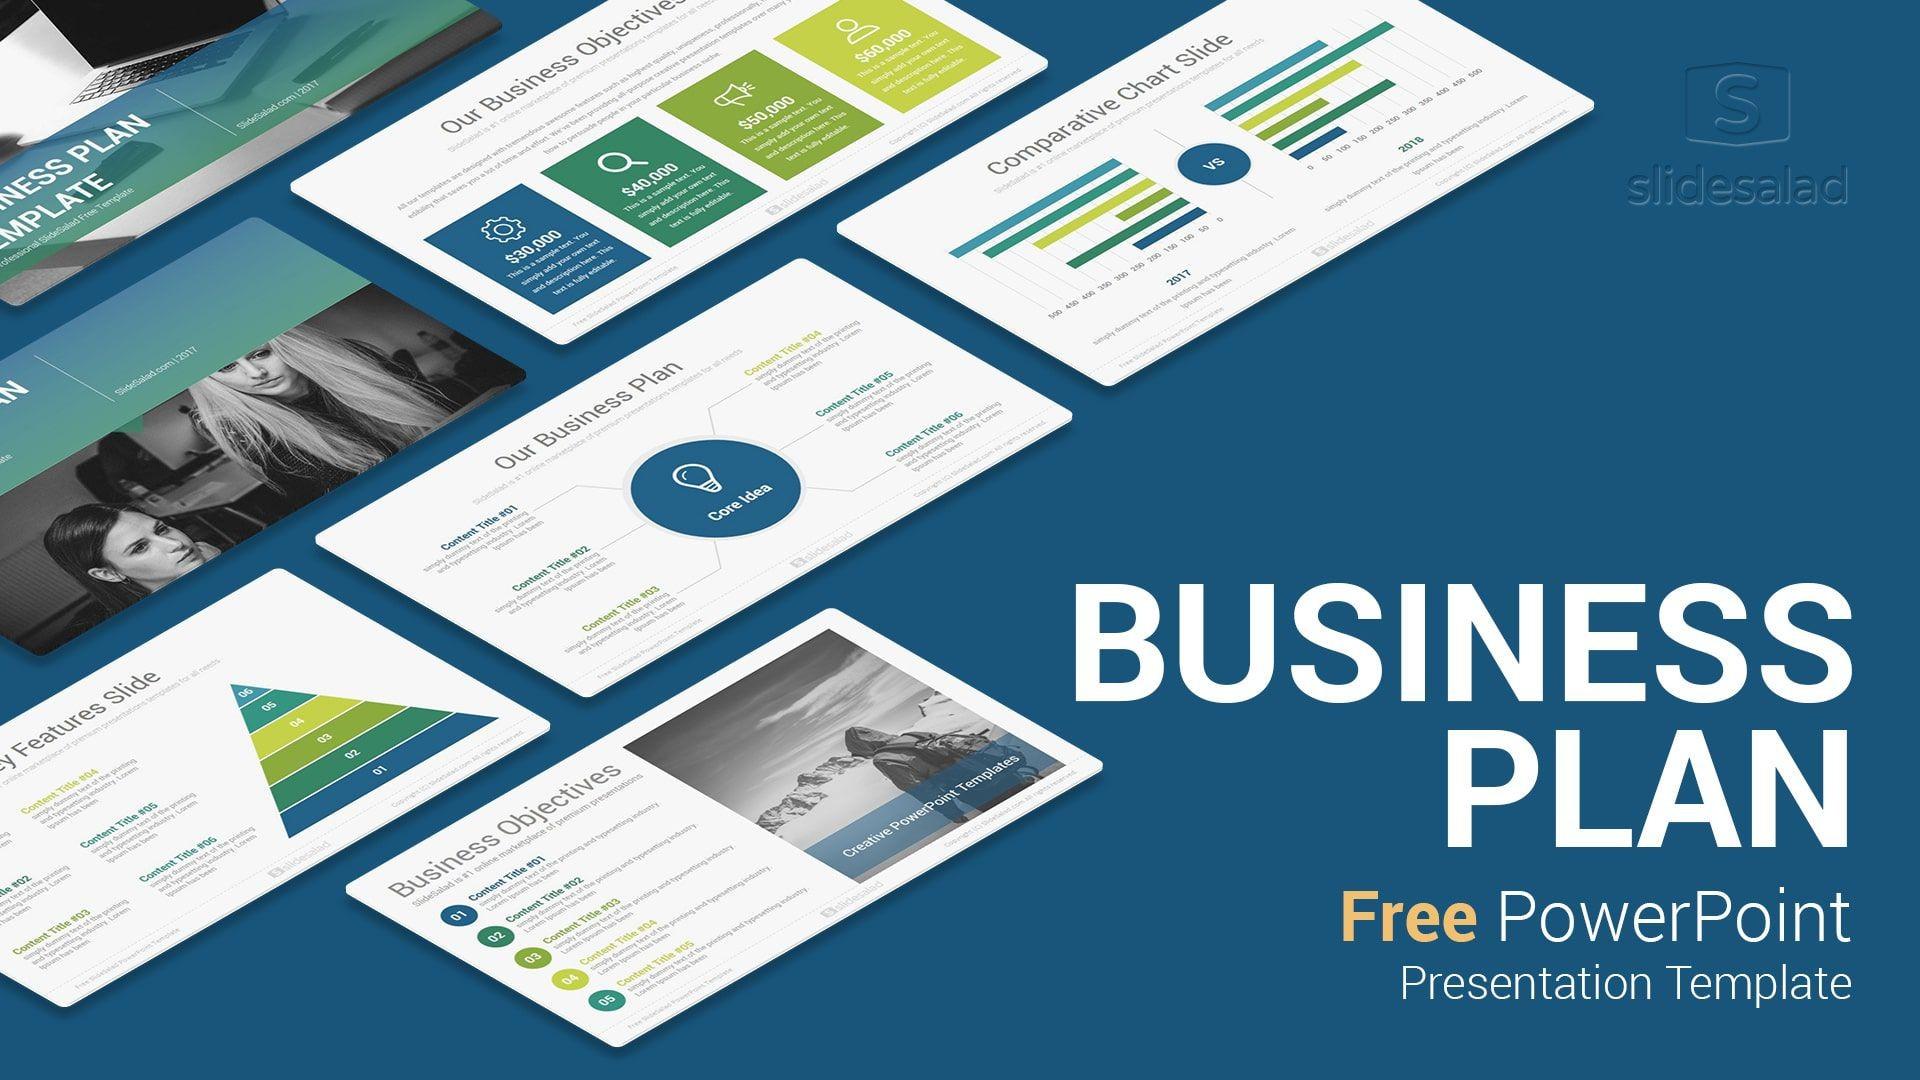 007 Beautiful Free Busines Plan Powerpoint Template Download Design  Modern Ultimate1920